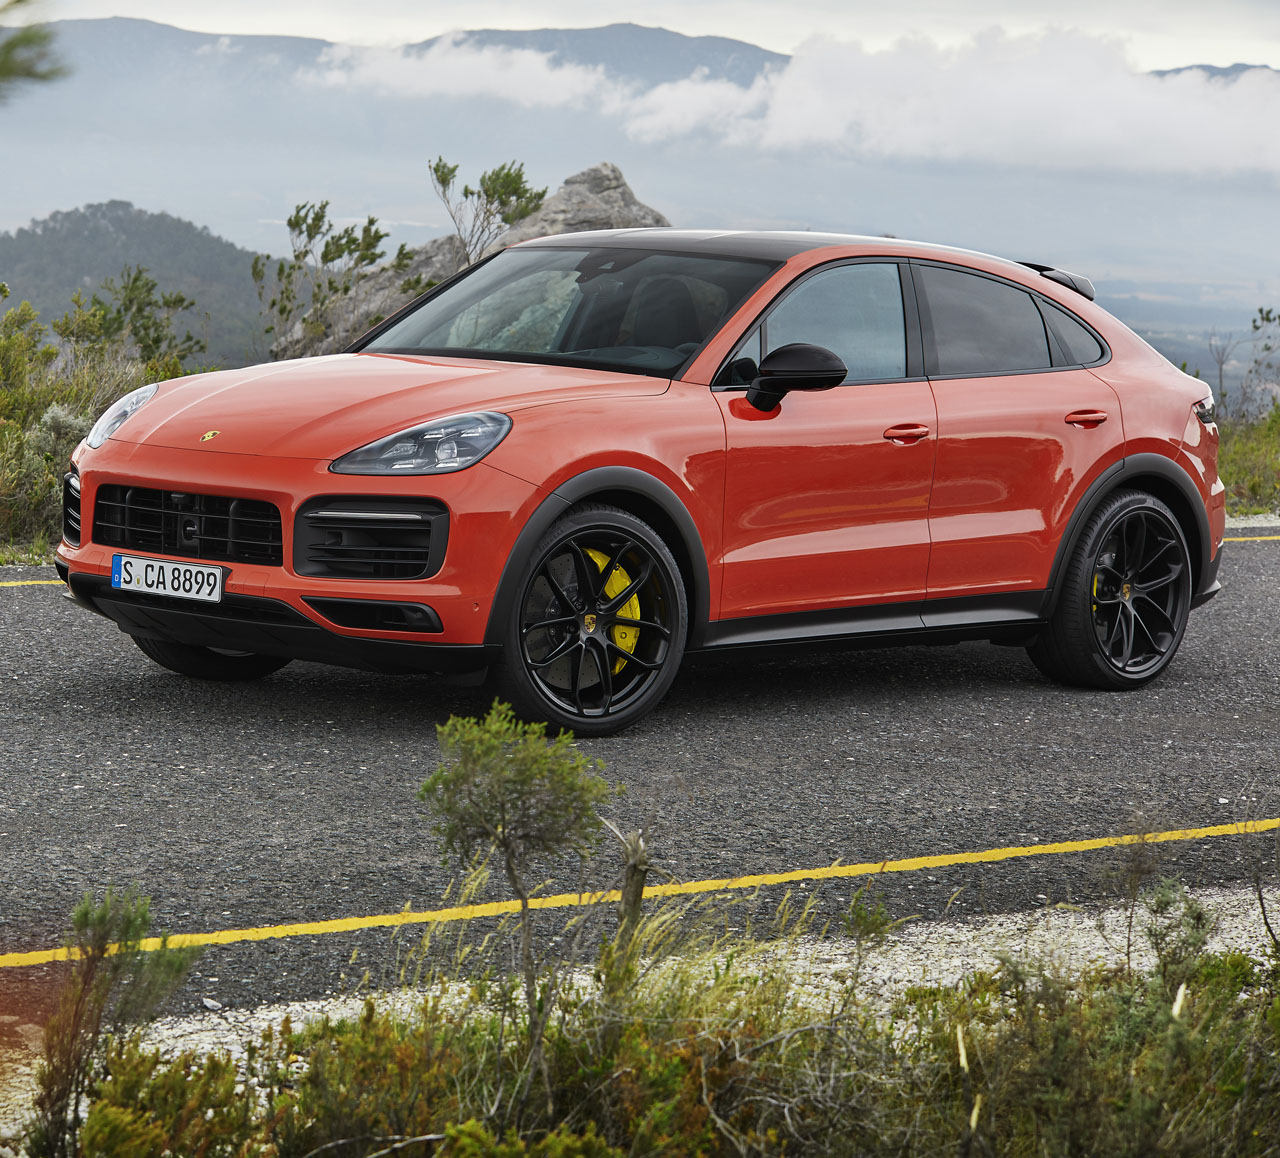 Porsche Crossover Suv: Hot New 2020 Porsche Cayenne Coupé Unveiled